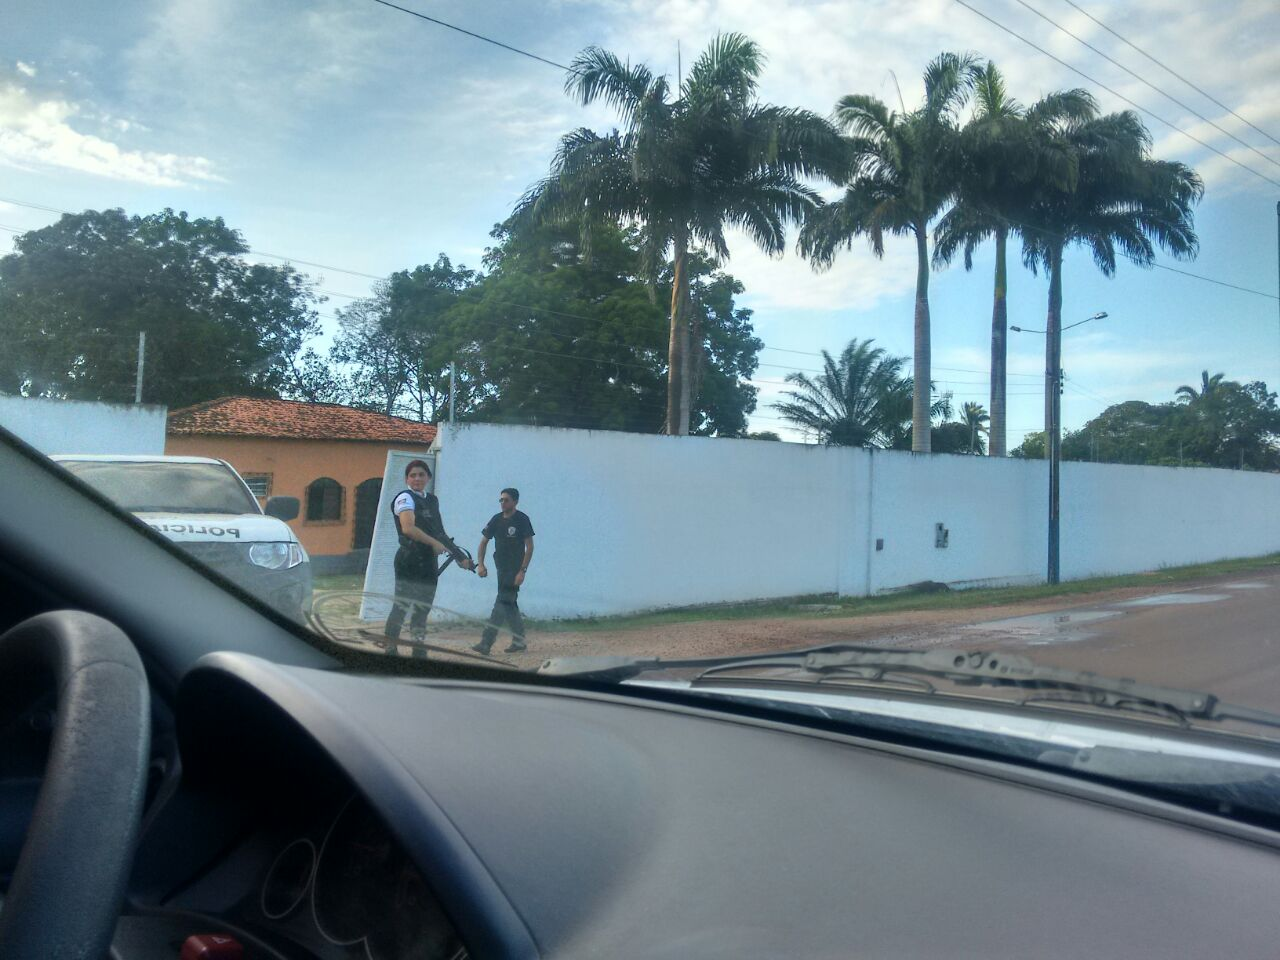 policia-casa-domingos-curio-turilandia-2